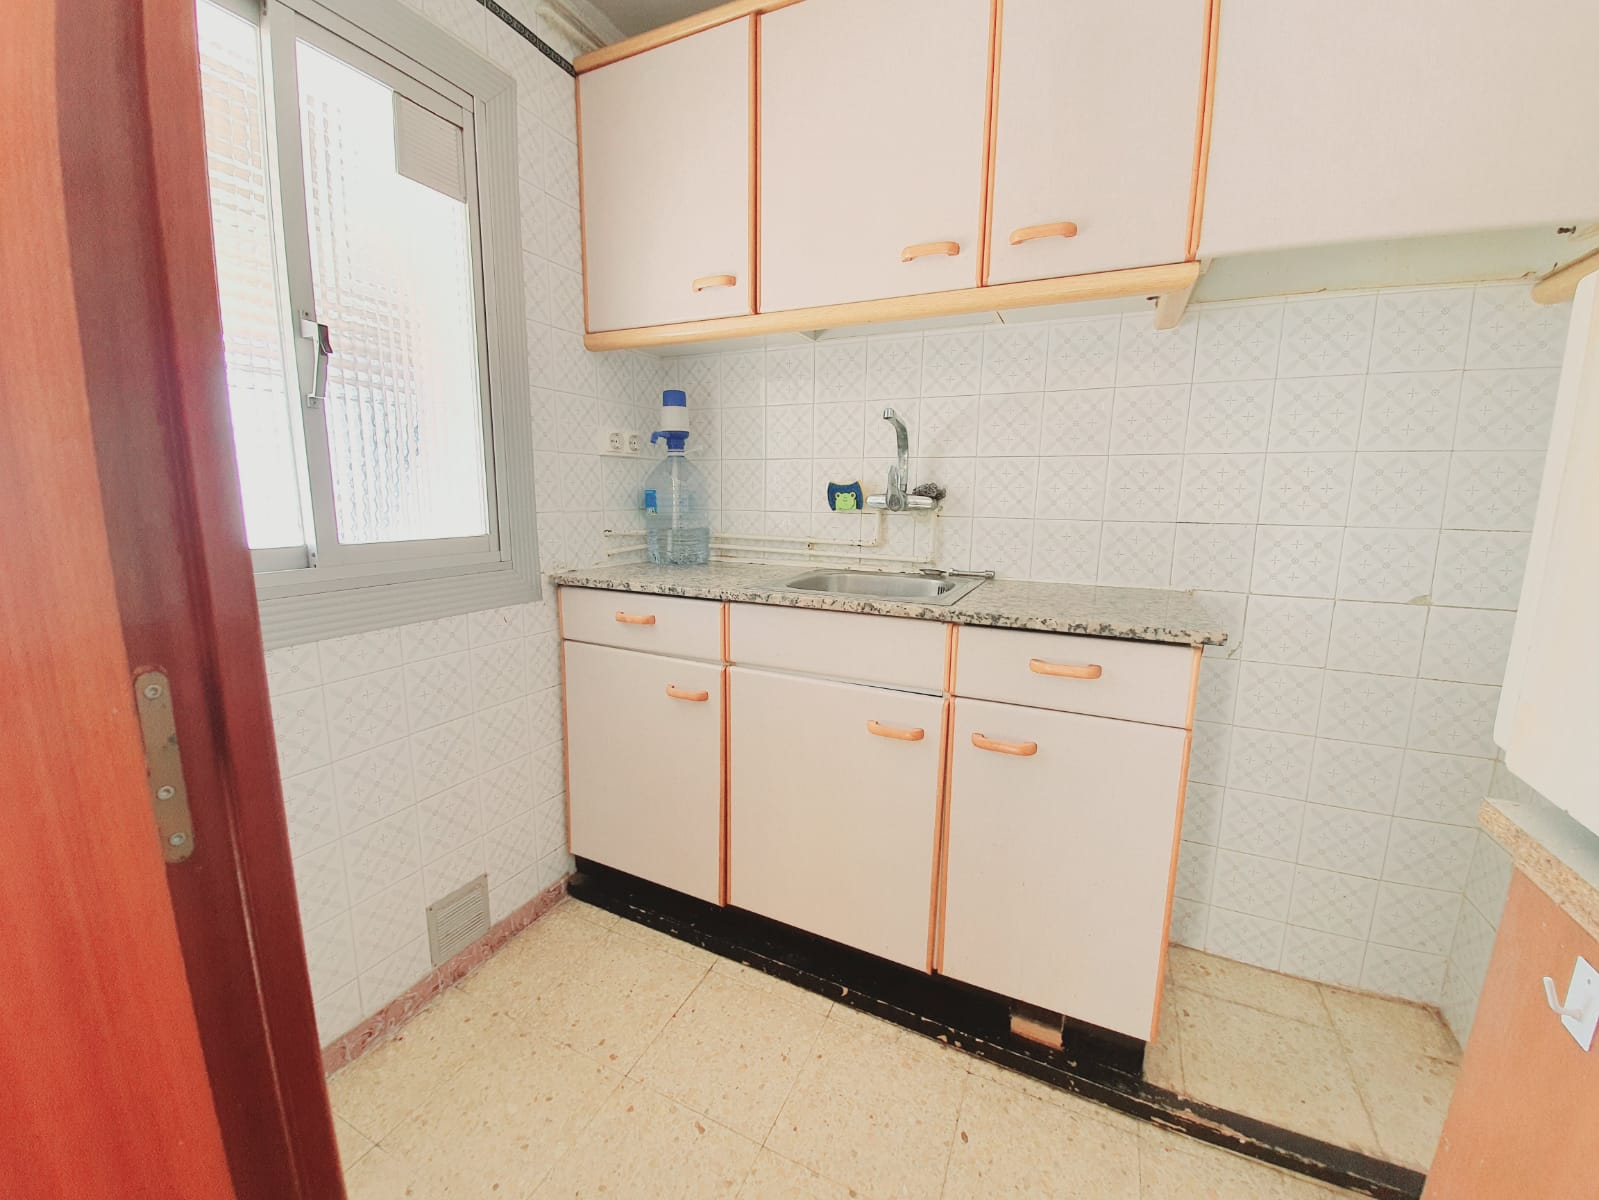 Piso en La florida en L'Hospitalet de llobregat en Venta por 92.000€